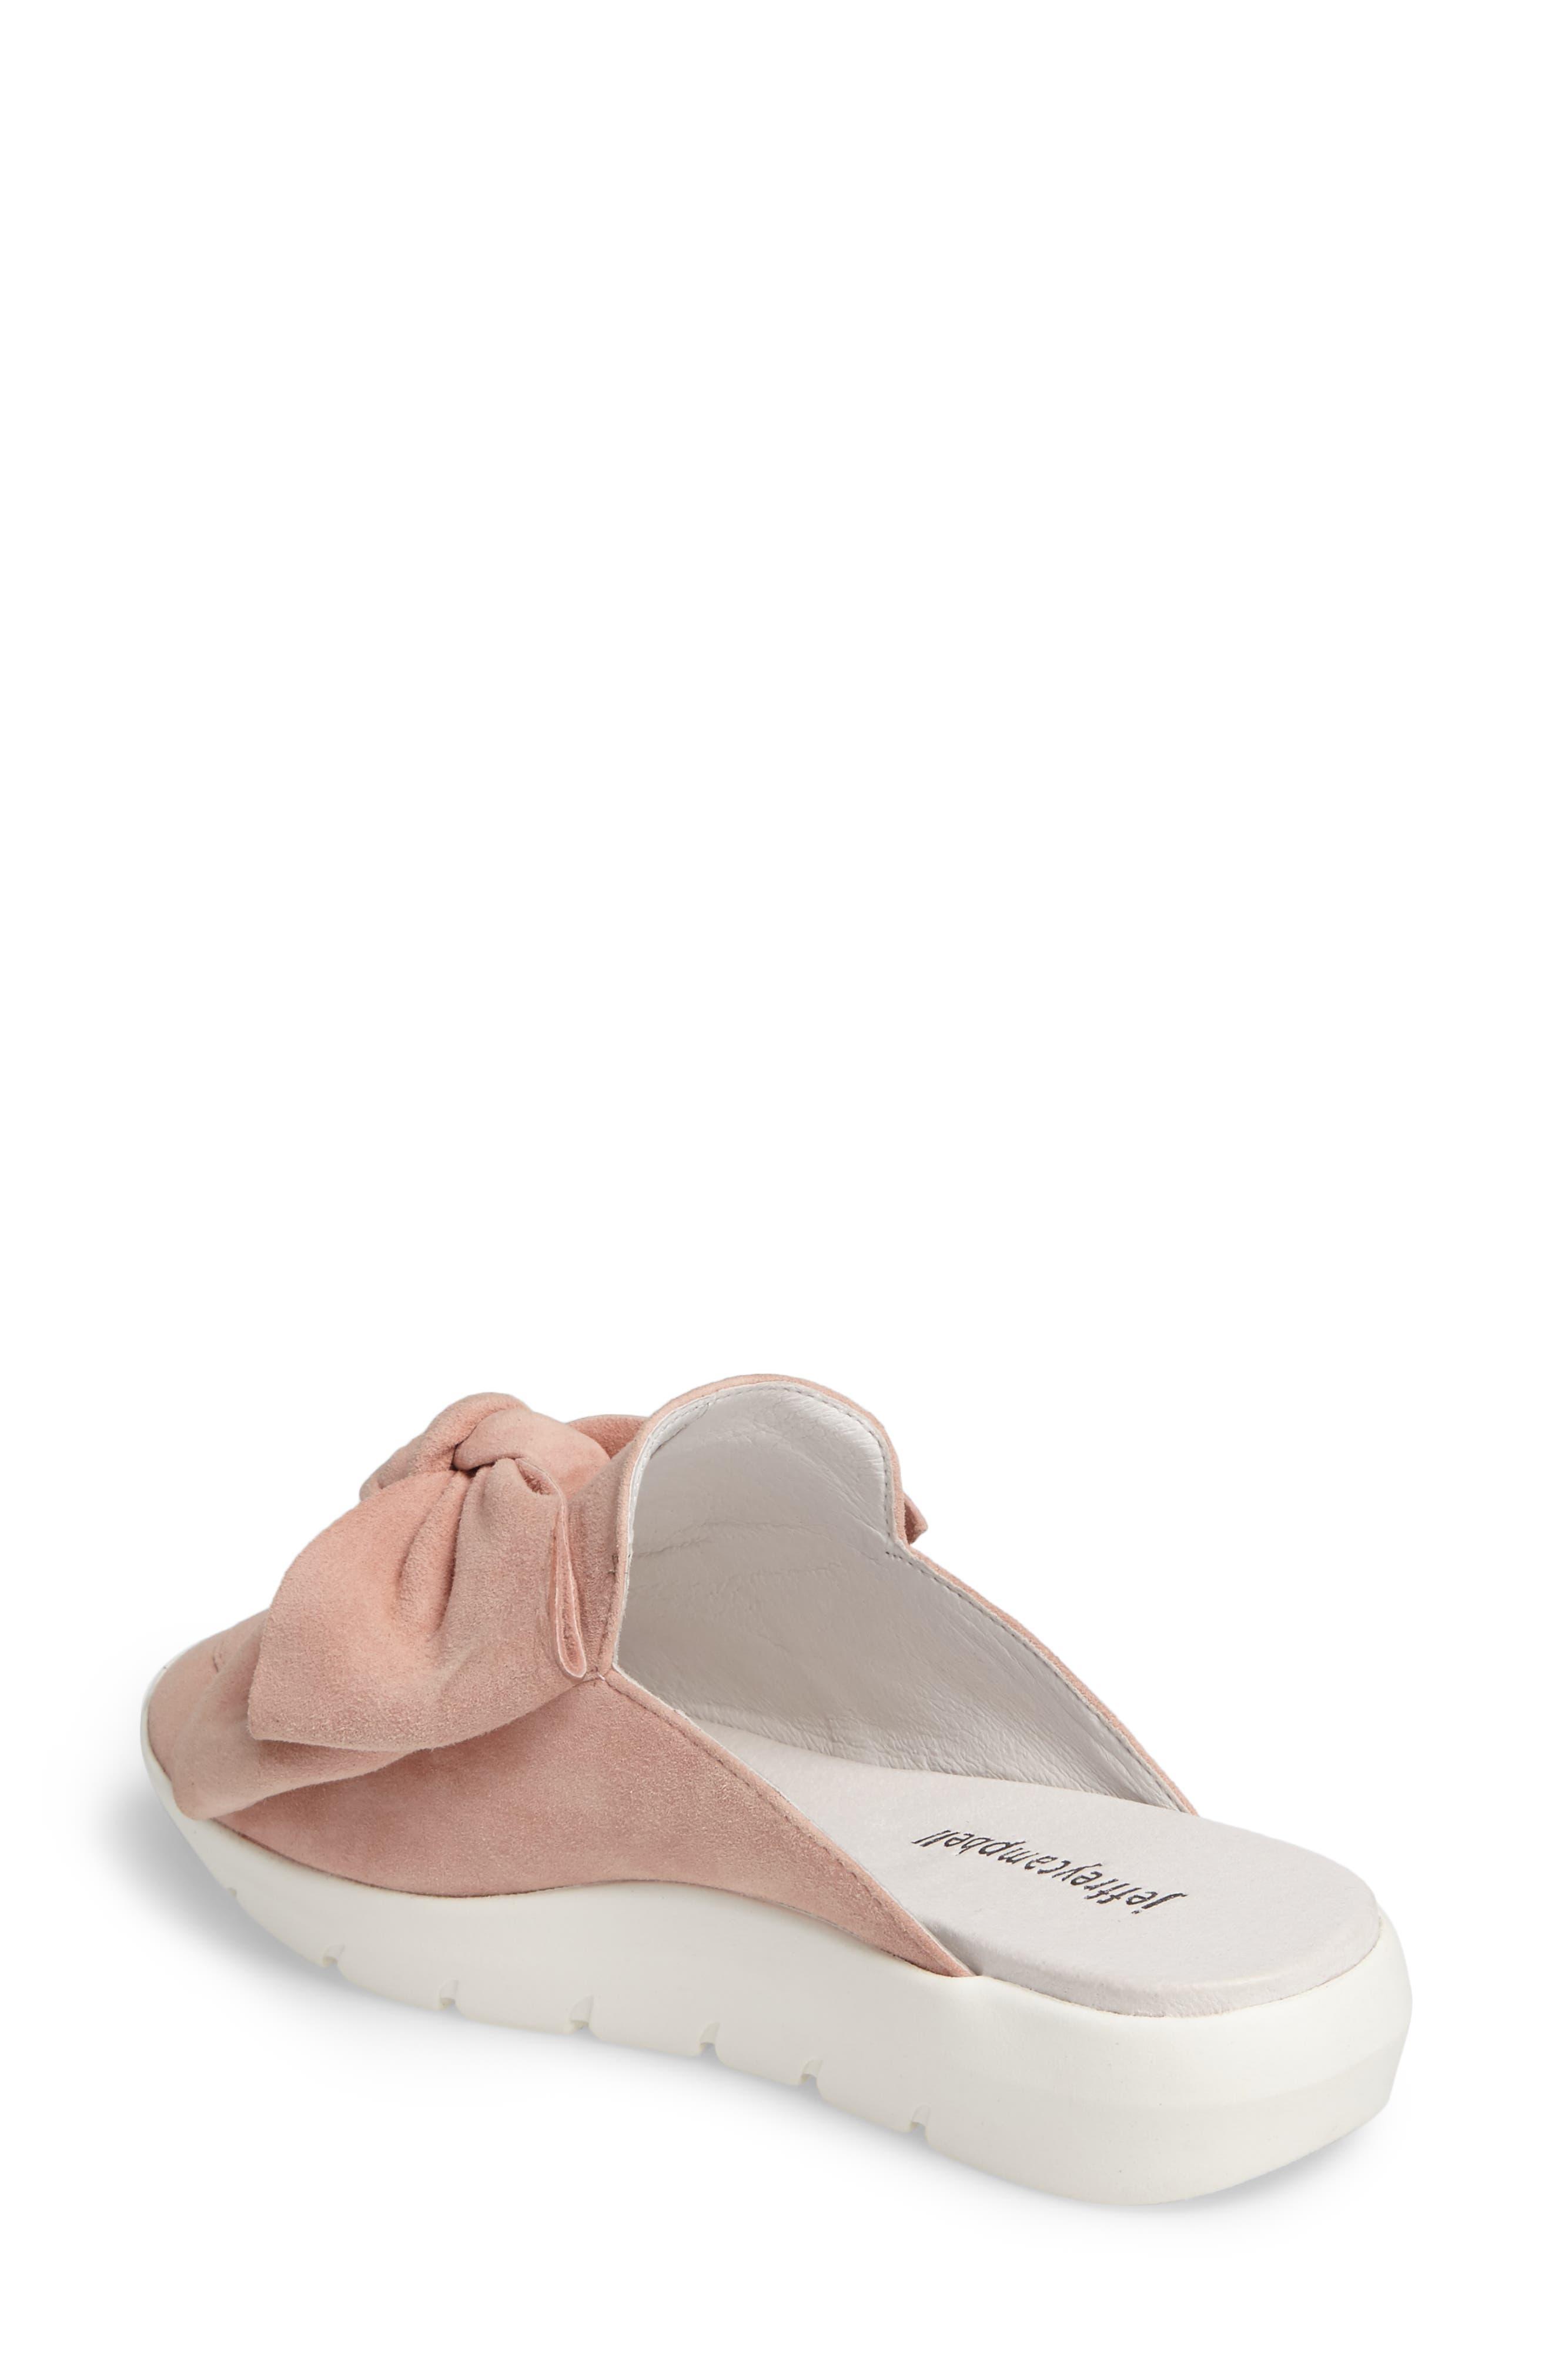 Tibow Platform Slide Sneaker,                             Alternate thumbnail 2, color,                             Pale Pink Suede